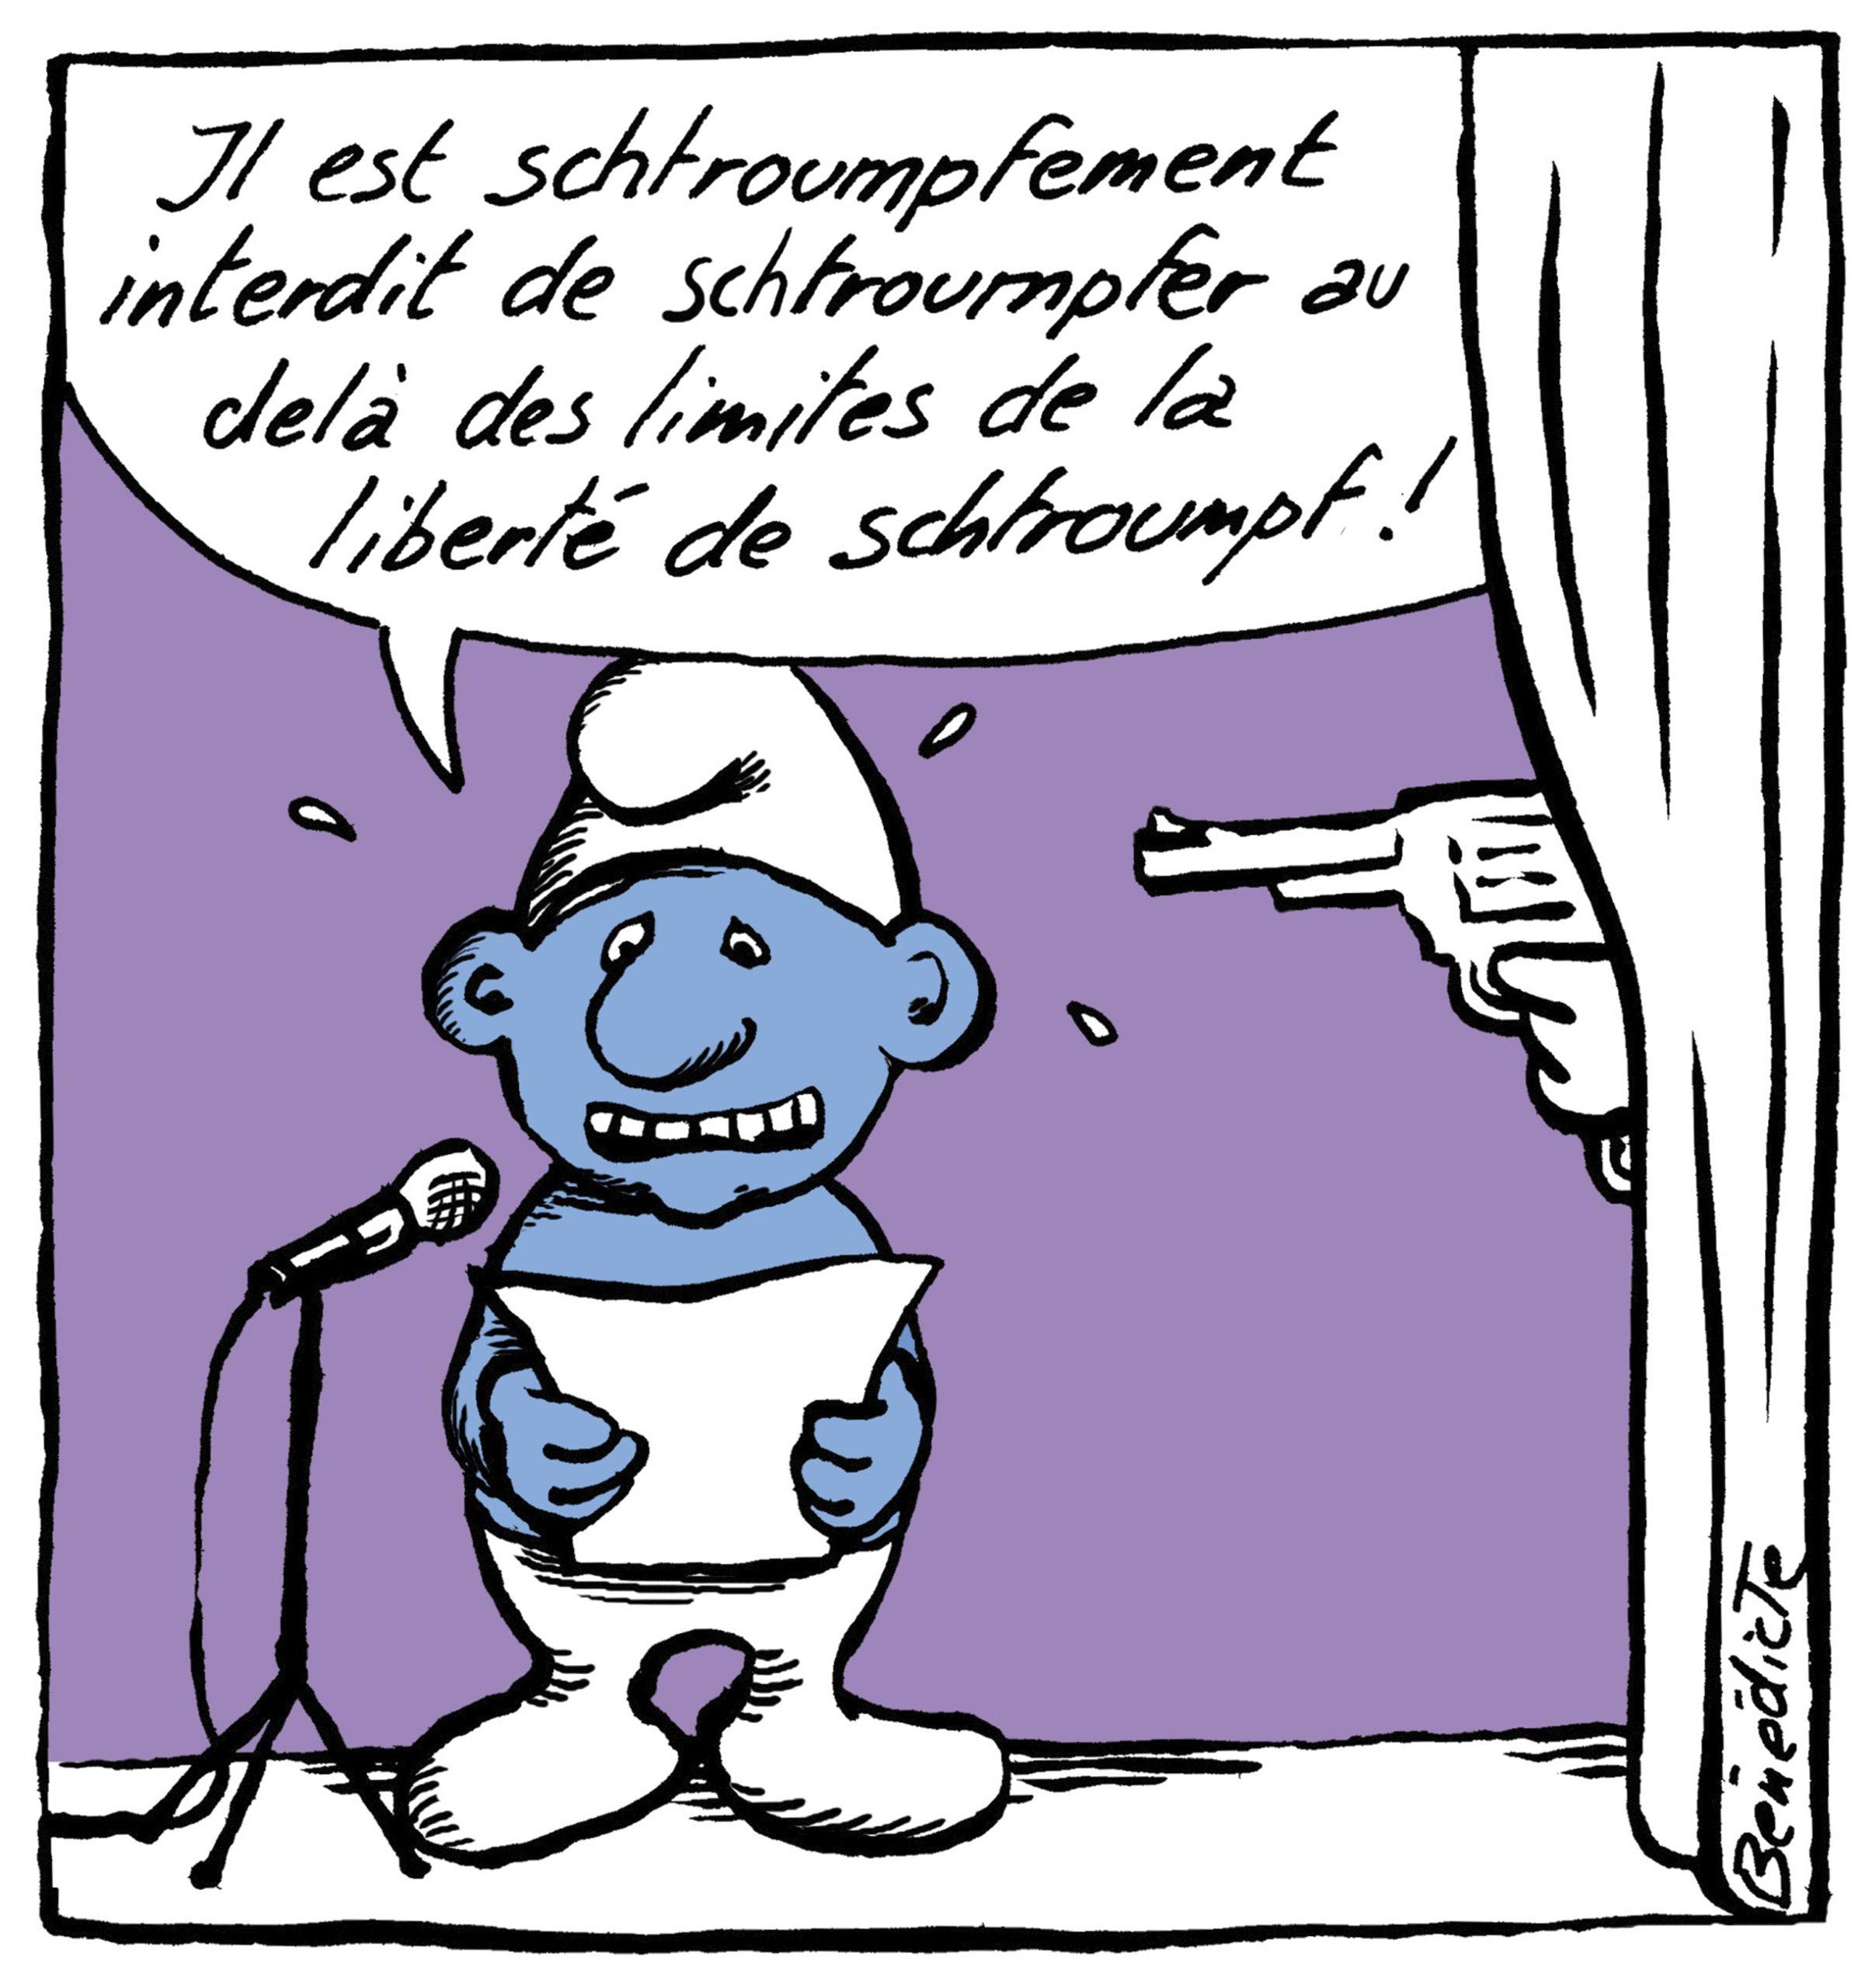 Bénédicte (Suisse) – Cartooning for Peace